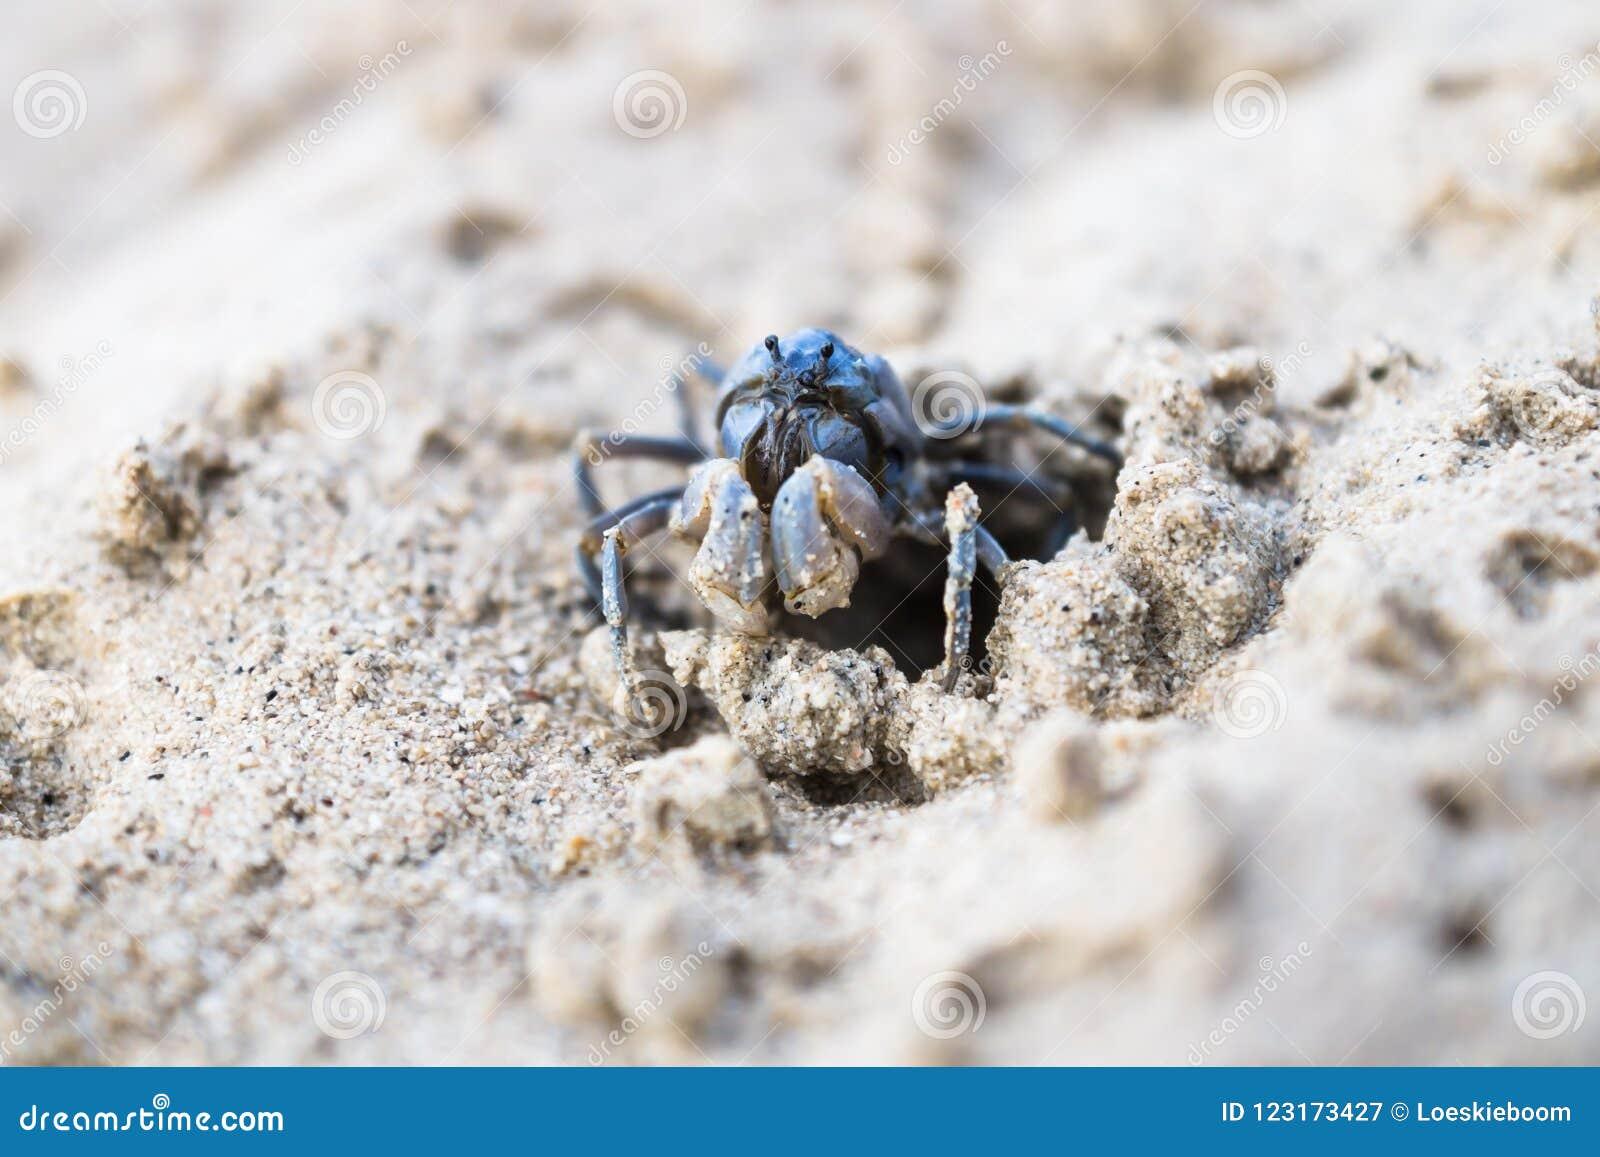 Blå krabba på ett hål i mitt på den vita stranden av Siquijor, Filippinerna, Asien